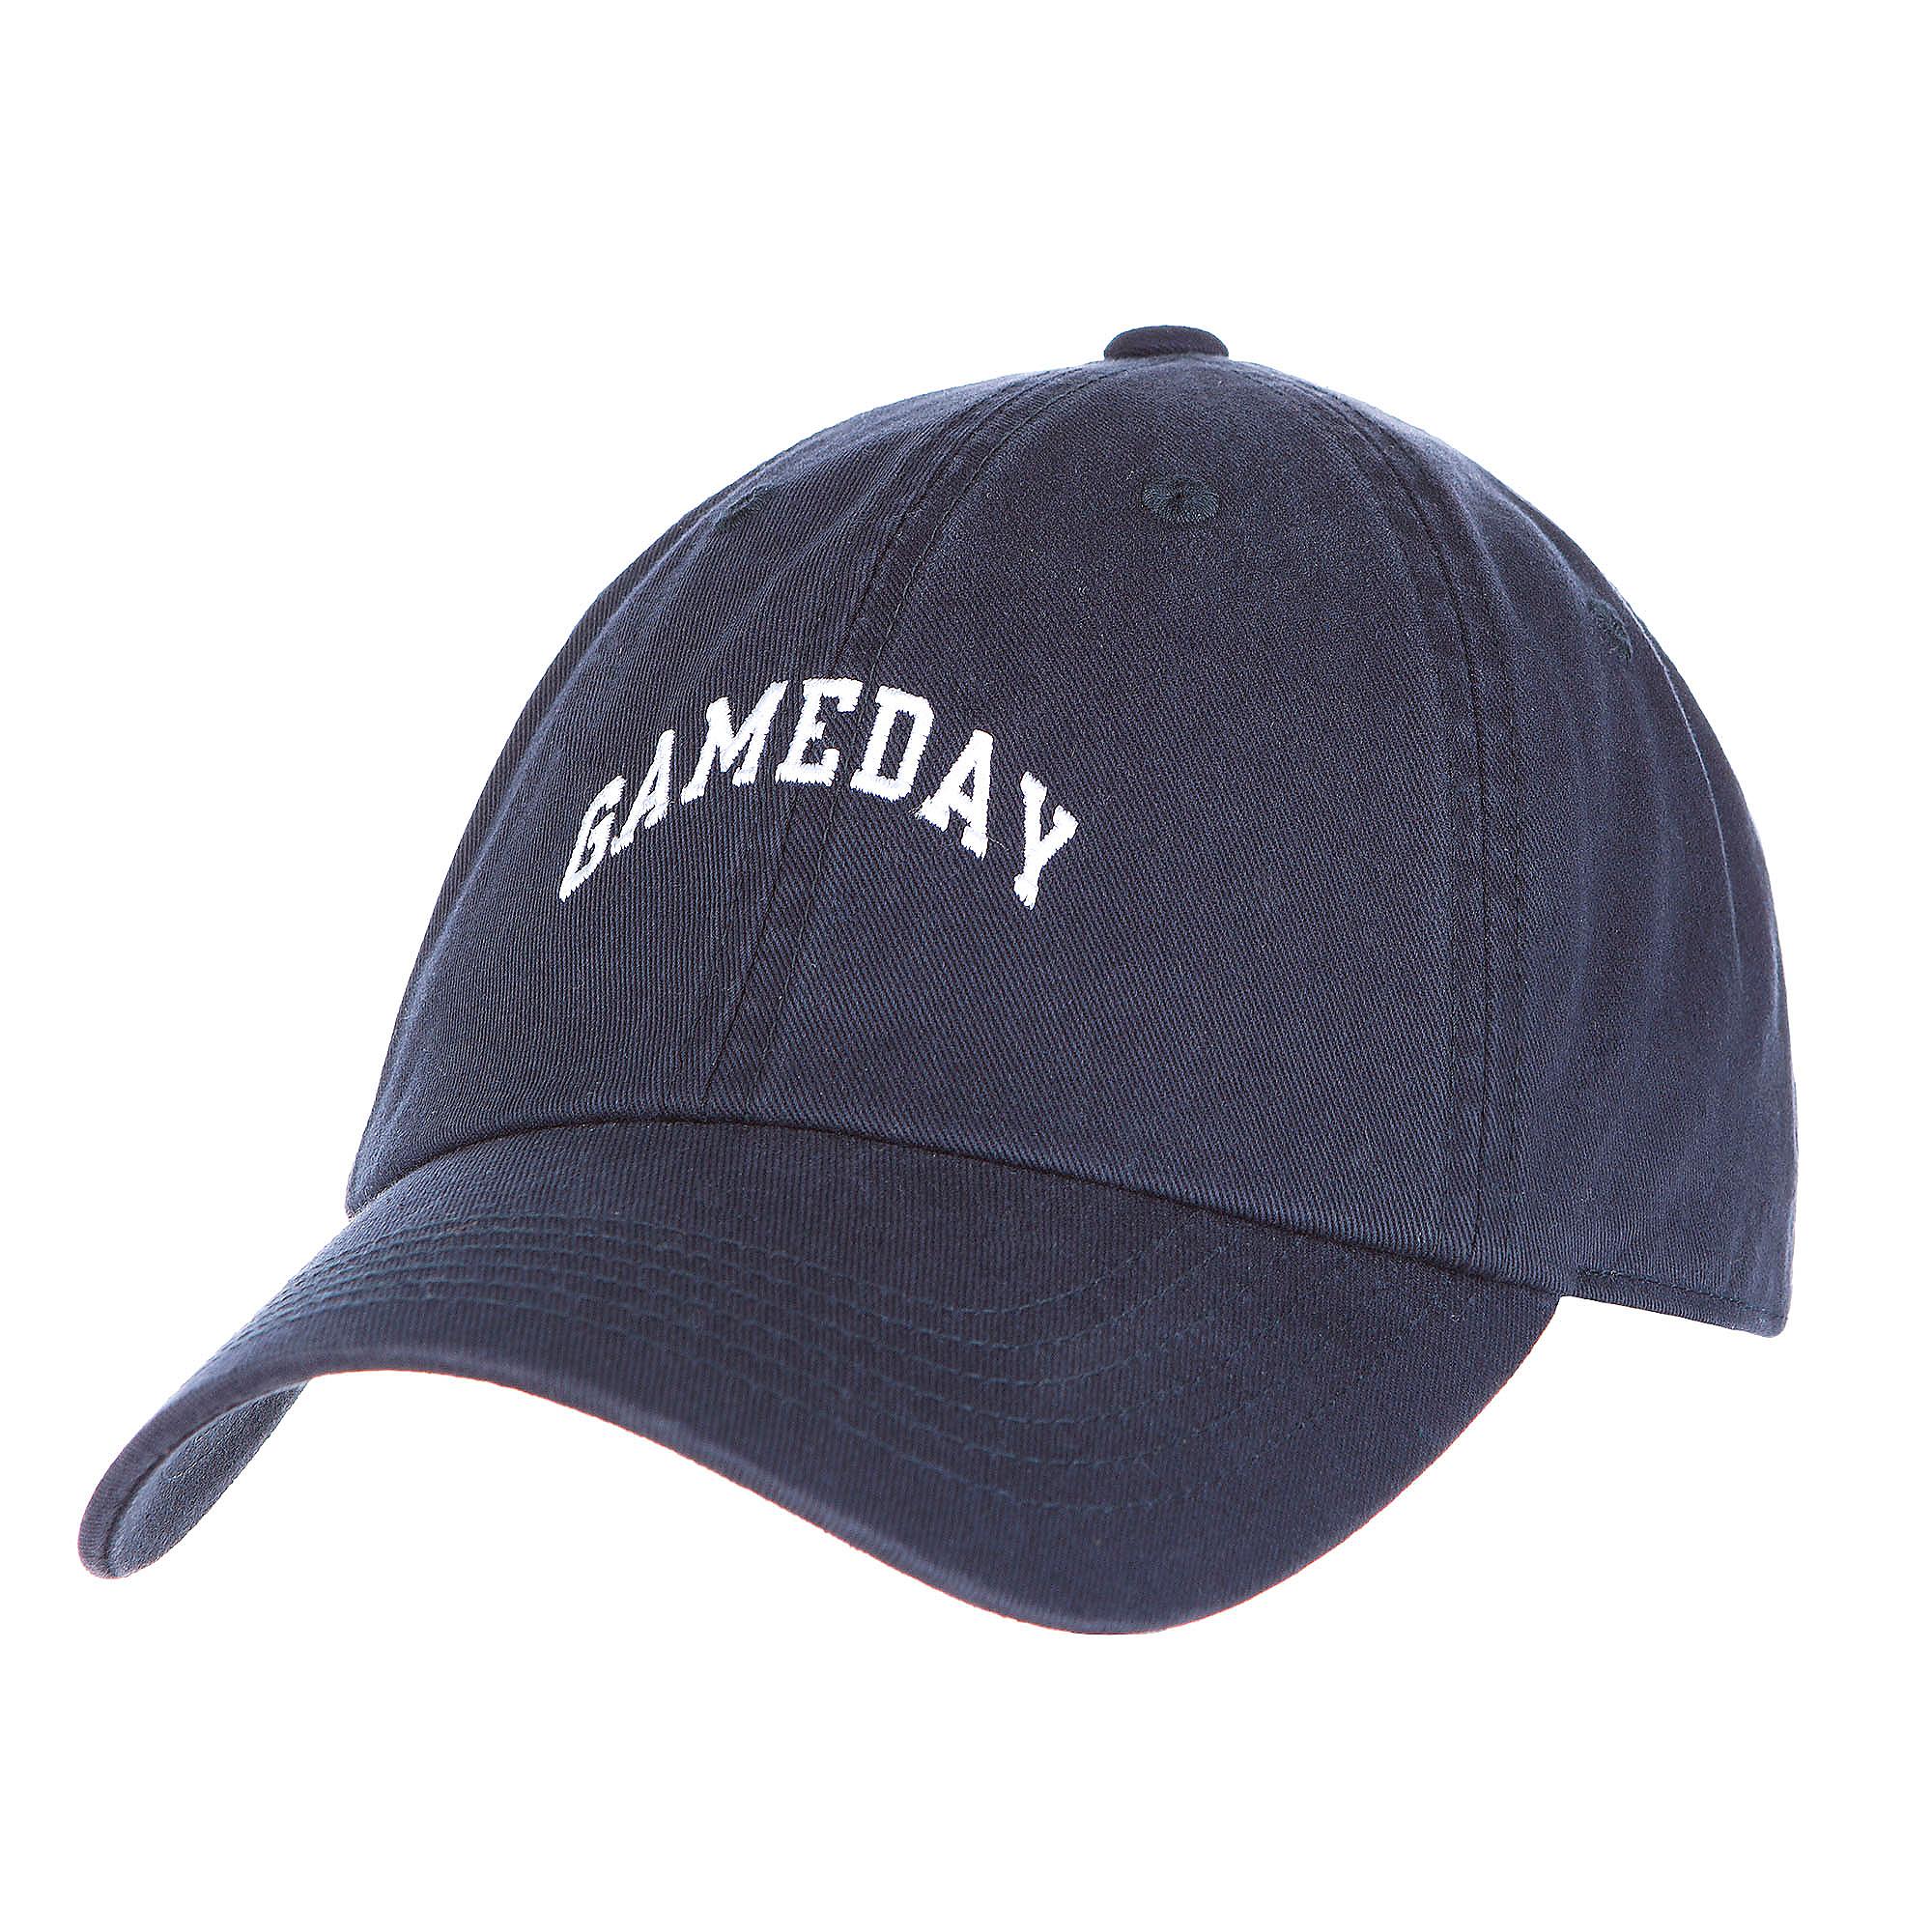 Dallas Cowboys Gameday Franchise Tag Cap